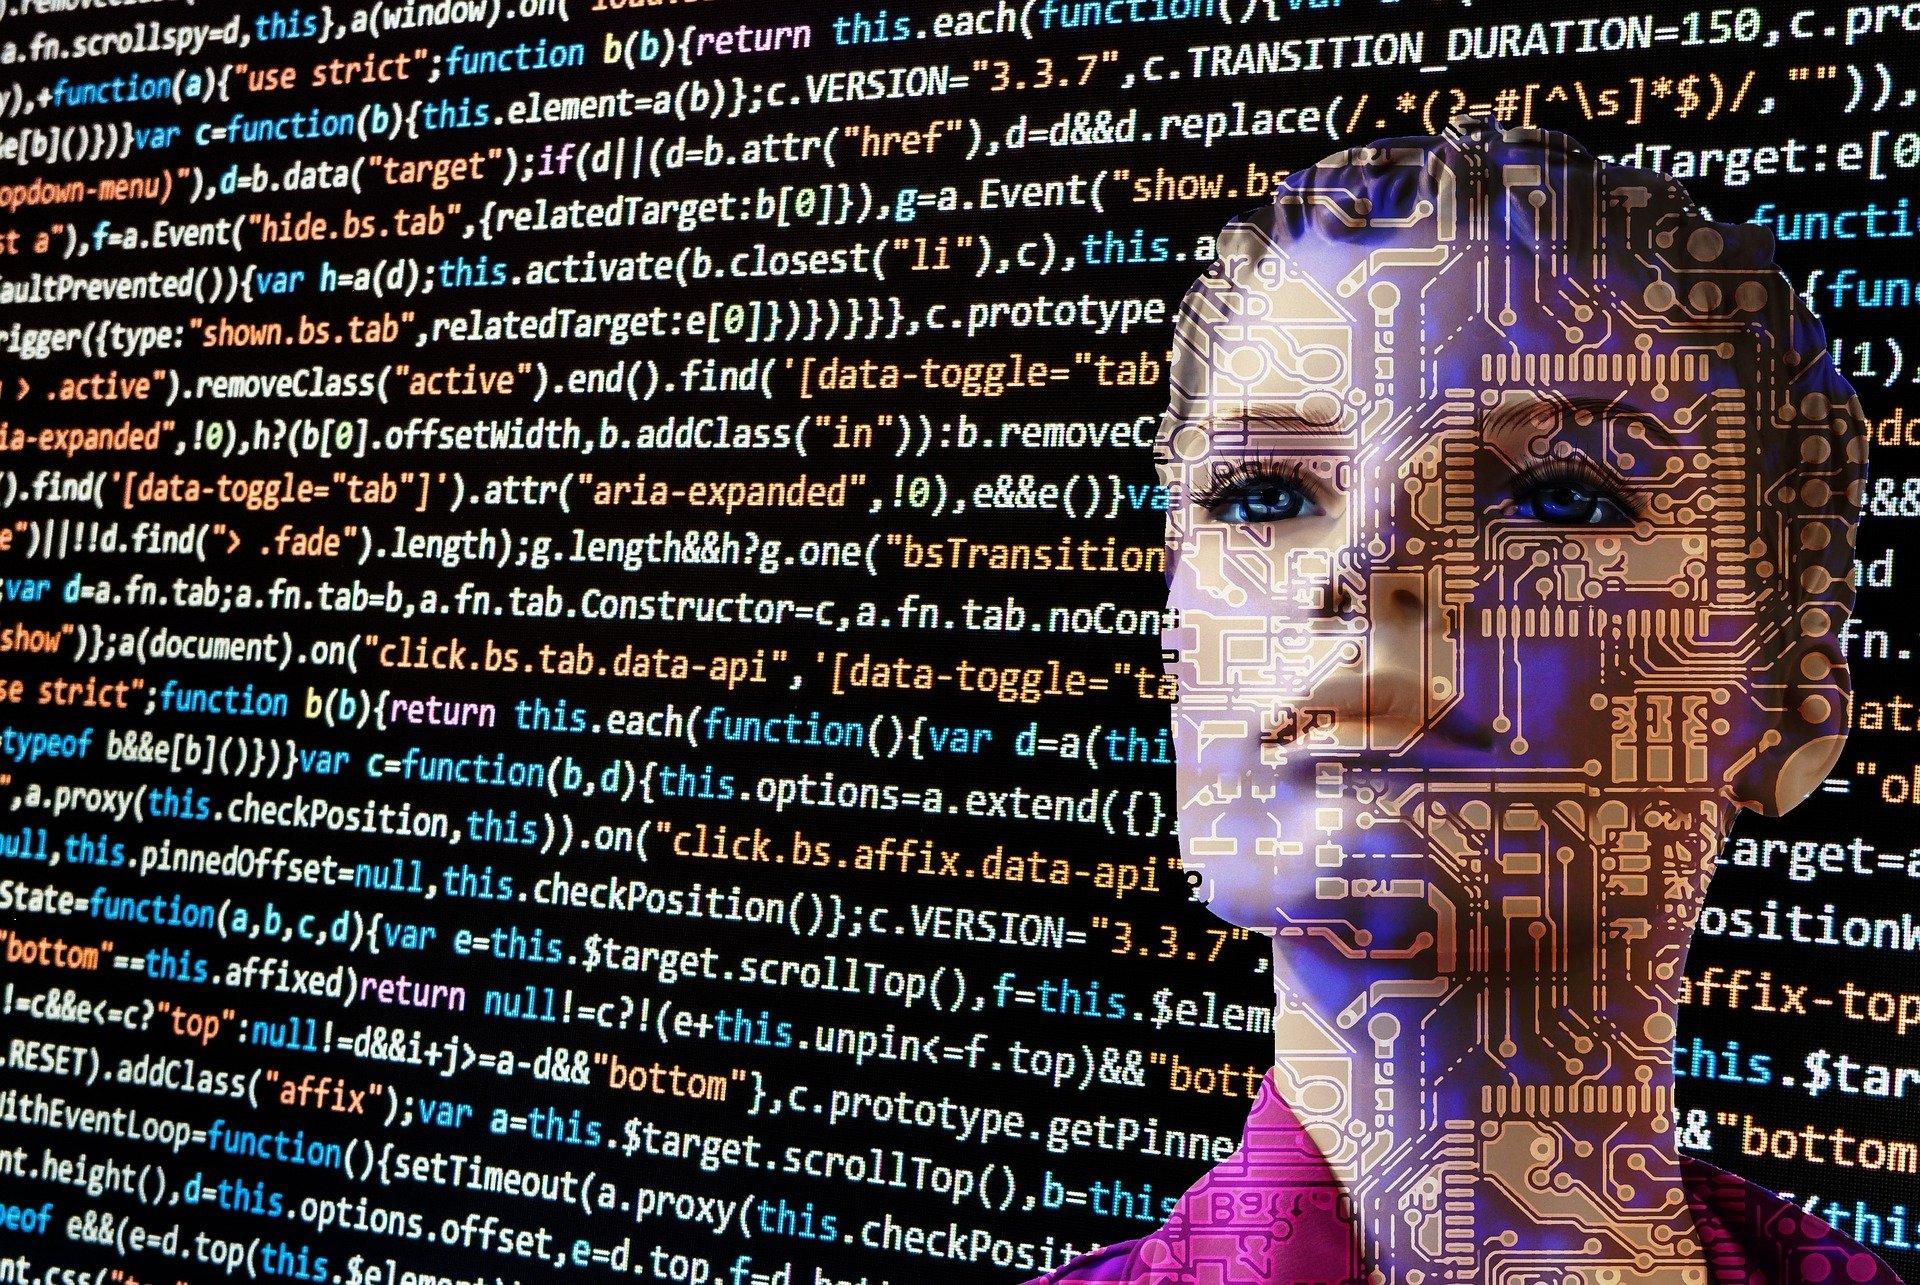 Artificial Intelligence - Image by Gerd Altmann